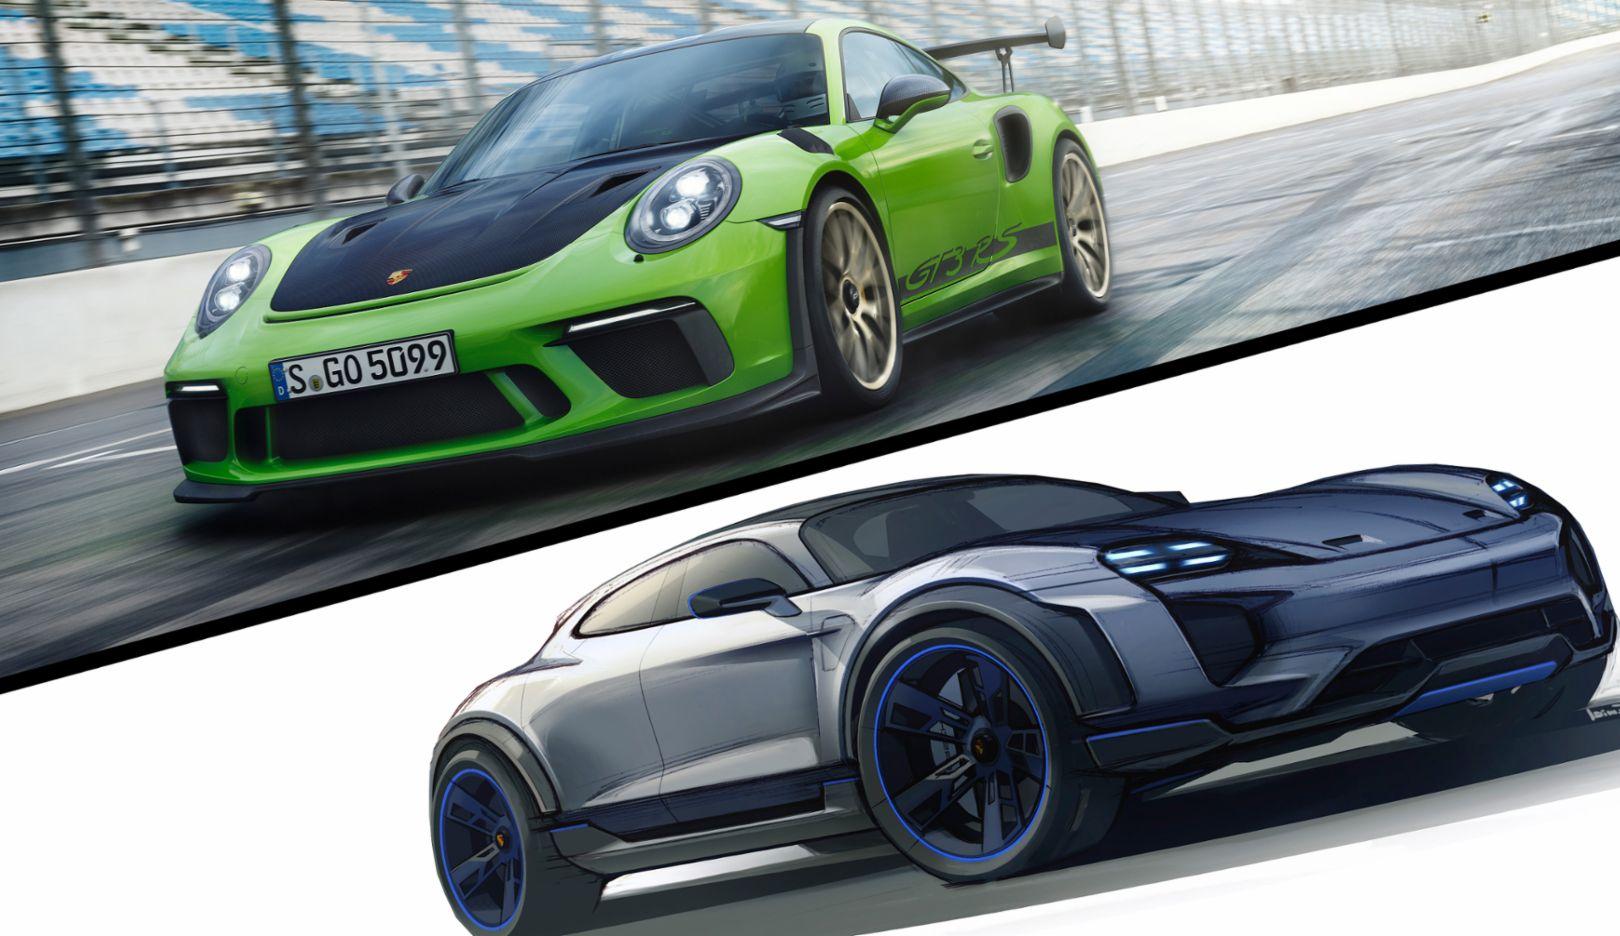 911 GT3 RS, Mission E Cross Turismo, 2018, Porsche AG